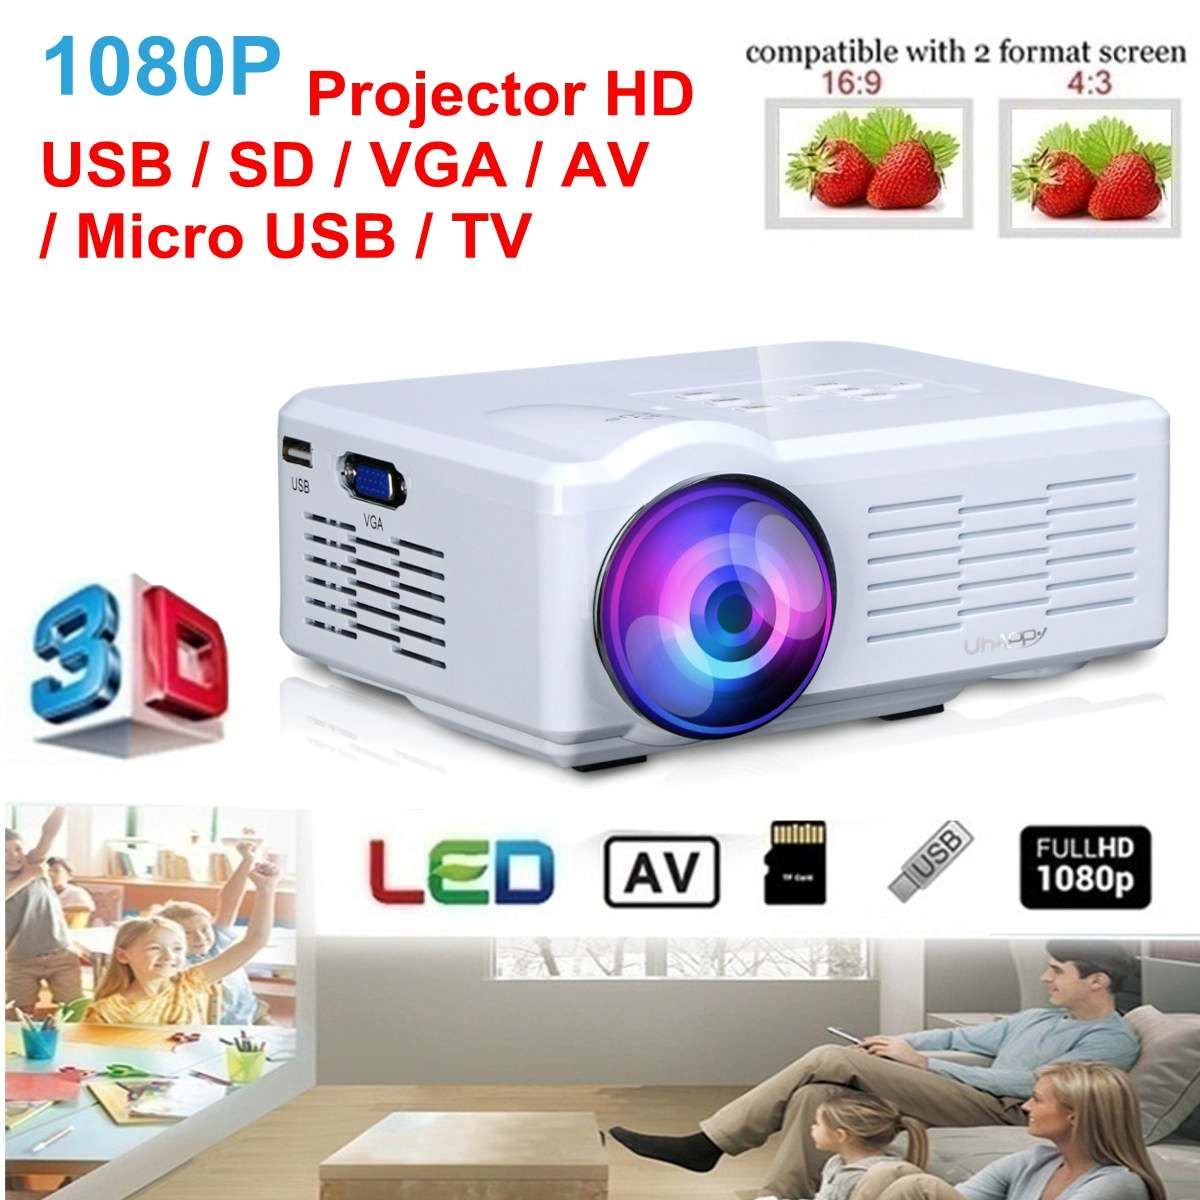 Projecteur U35 mini projecteur LED USB/SD/VGA/HDMI/AV LED projecteur Portable HD pour Home CinemaProjecteur U35 mini projecteur LED USB/SD/VGA/HDMI/AV LED projecteur Portable HD pour Home Cinema